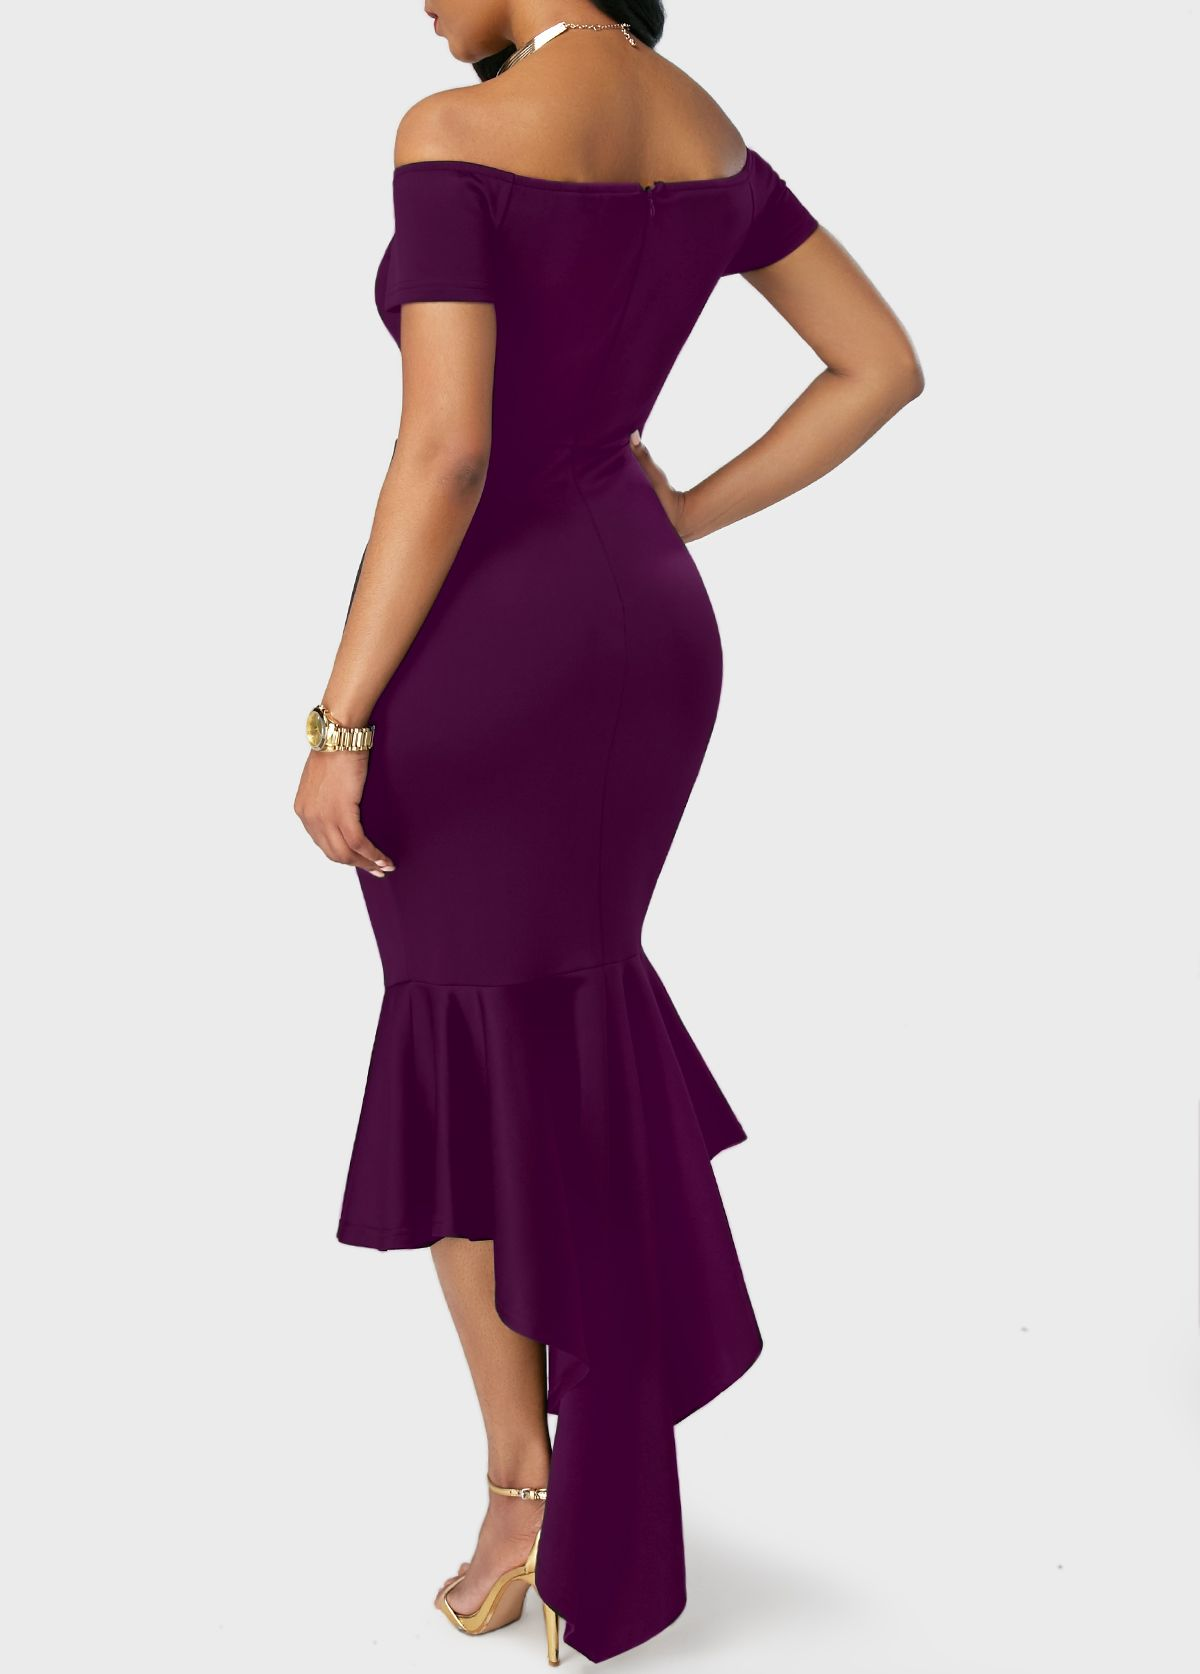 cc9ed528a51d Peplum Hem Split Neck Purple Bardot Dress on sale only US$34.90 now, buy  cheap Peplum Hem Split Neck Purple Bardot Dress at liligal.com